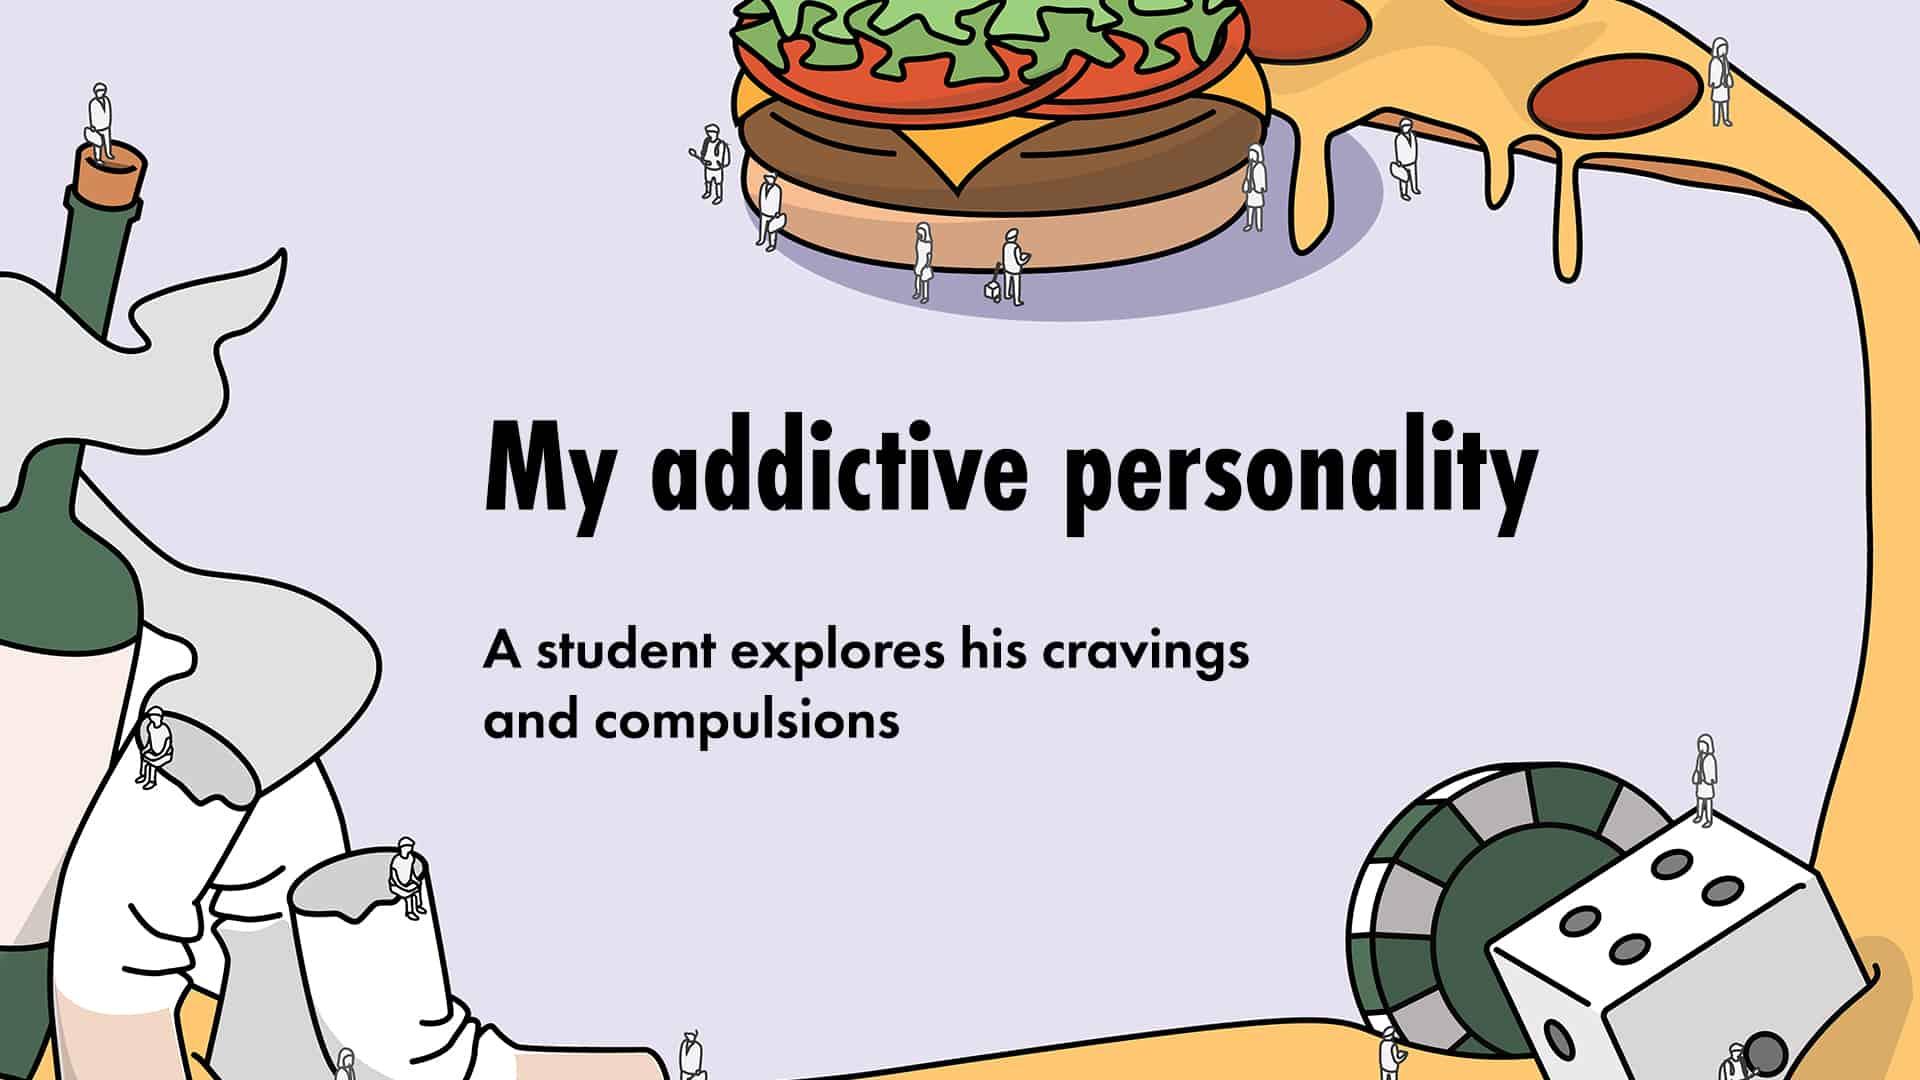 My addictive personality